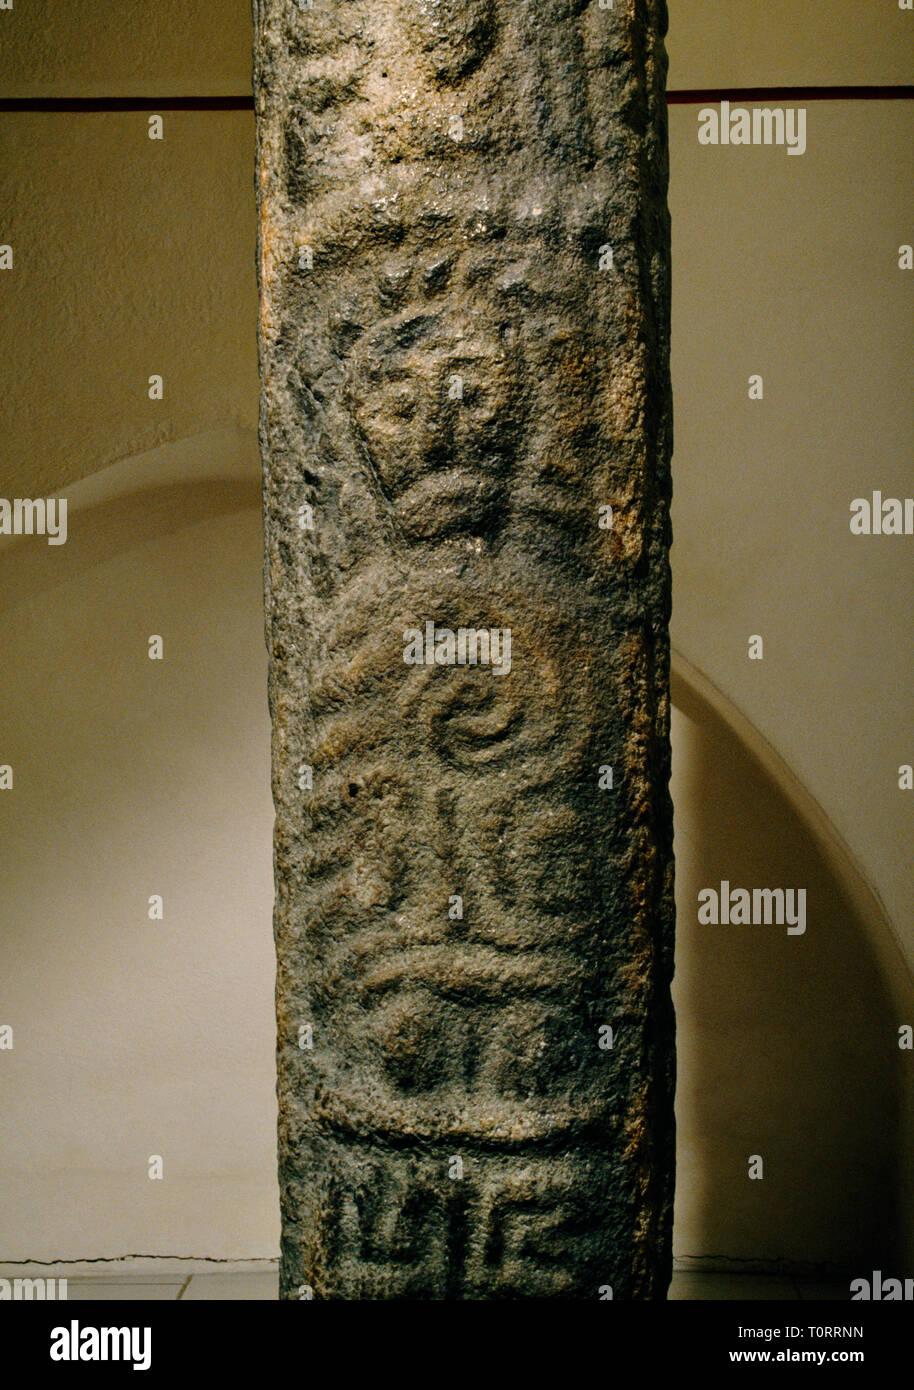 St Padarn's Cross: figure of a saint on front of C10th pillar cross in south transept museum of Llanbadarn Fawr parish church, Ceredigion, Wales, UK. - Stock Image